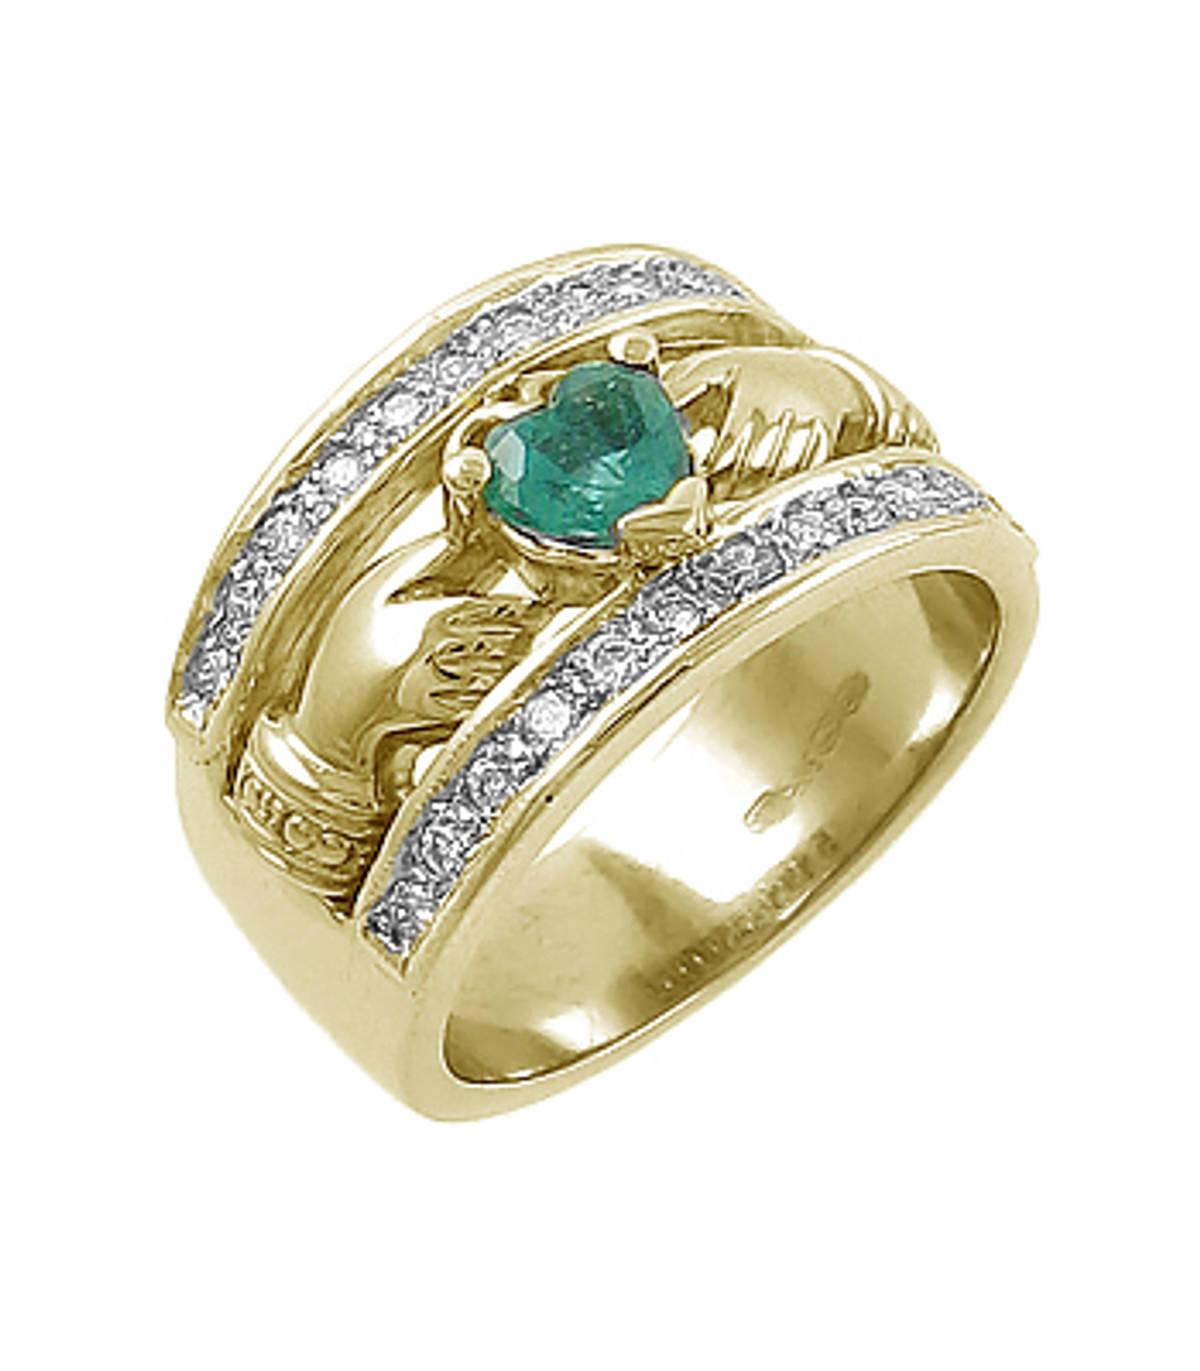 Irish made14 ct gold emerald 0.35cts/diamonds 0.26cts claddagh engagement ring